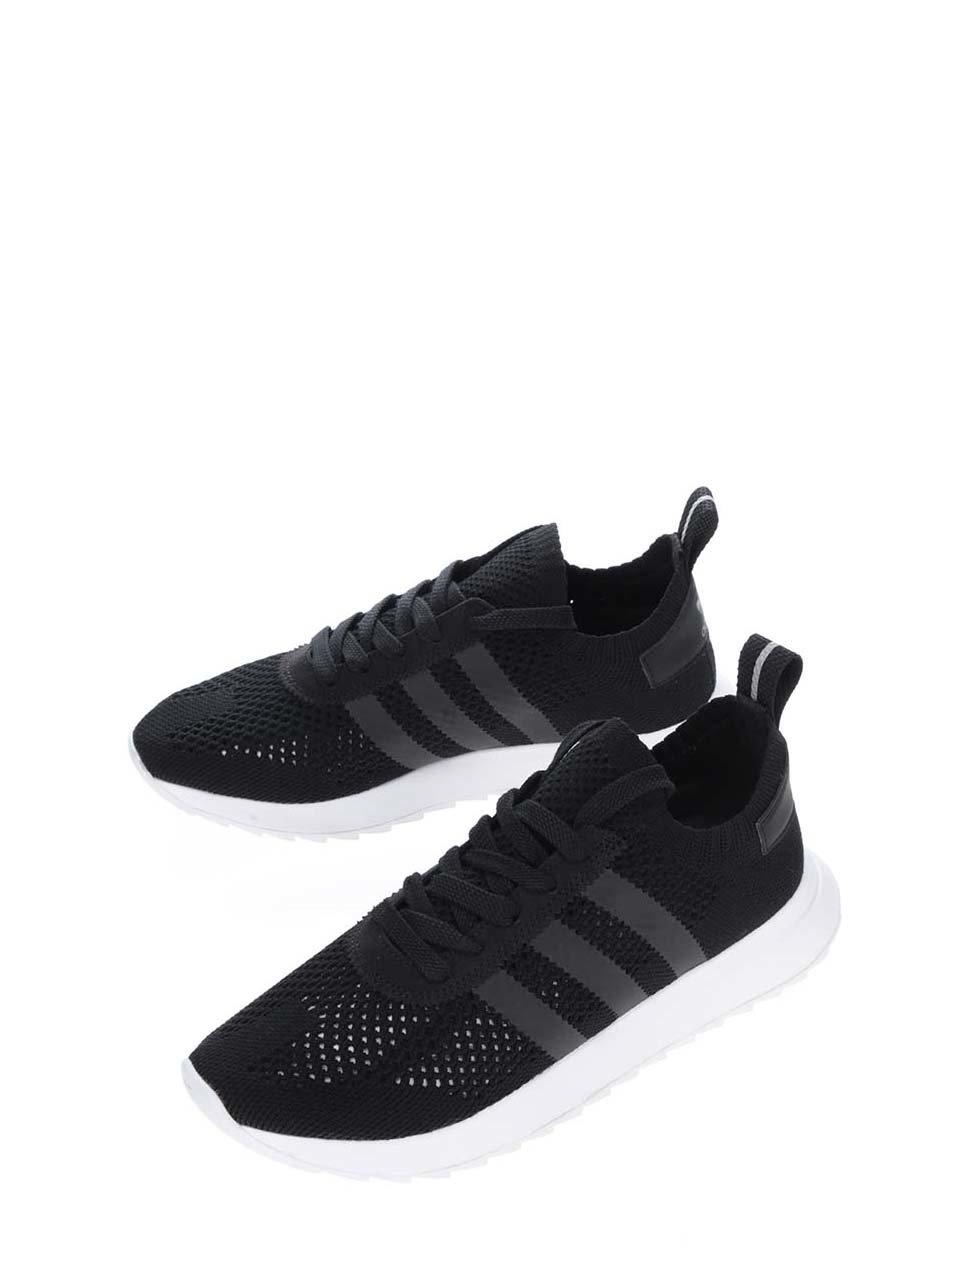 Čierne dámske tenisky adidas Originals Flashback ... 6d73f048c0a